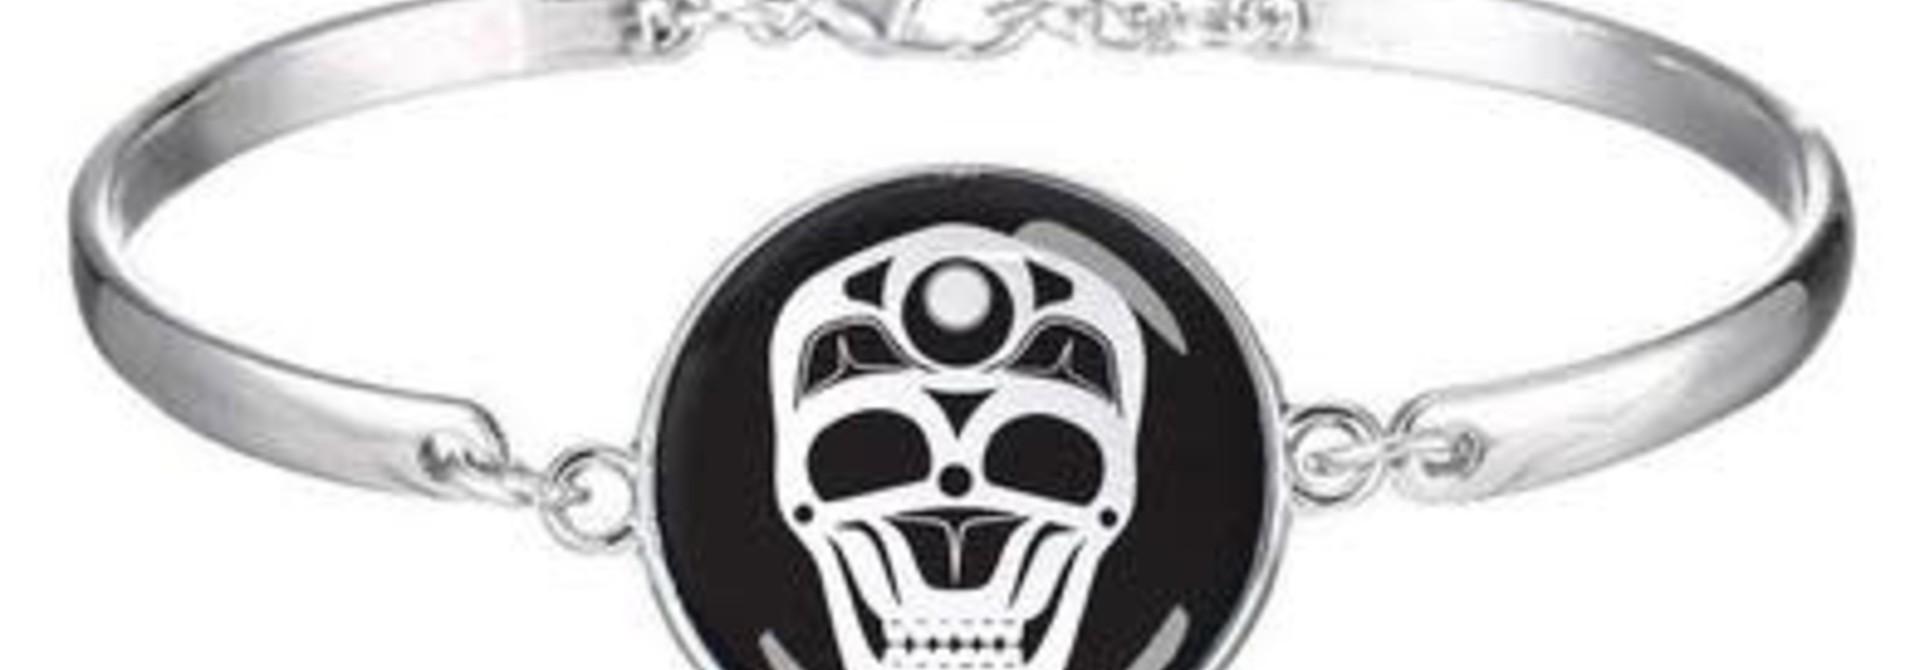 Dome Glass Bracelet - Skull by James Johnson